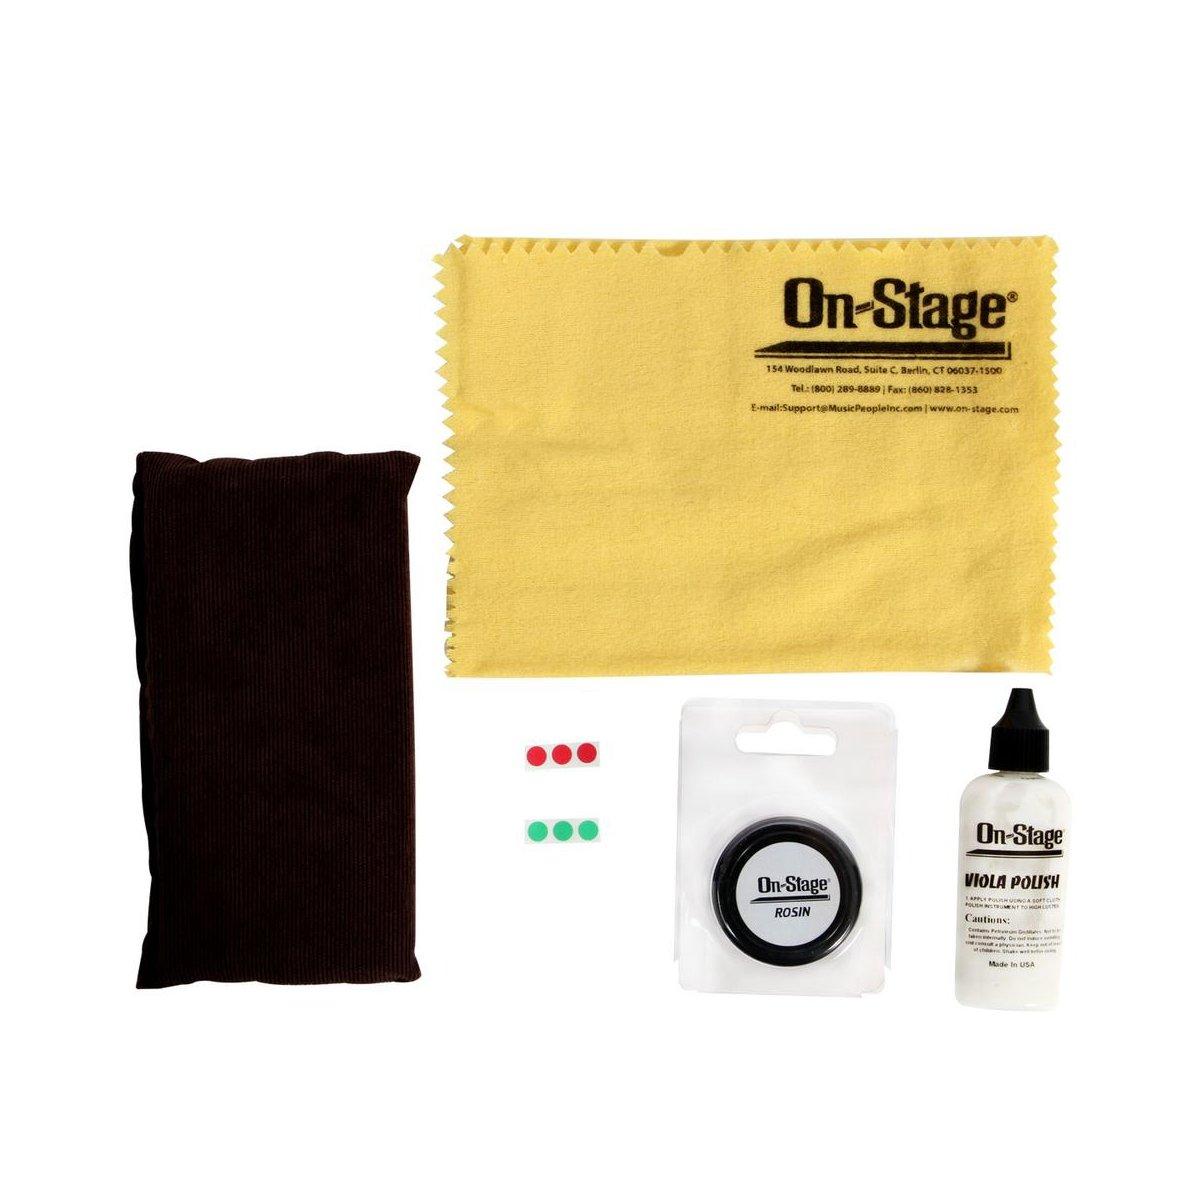 On-Stage TBK5700 Super Saver Maintenance Kit for Trombone